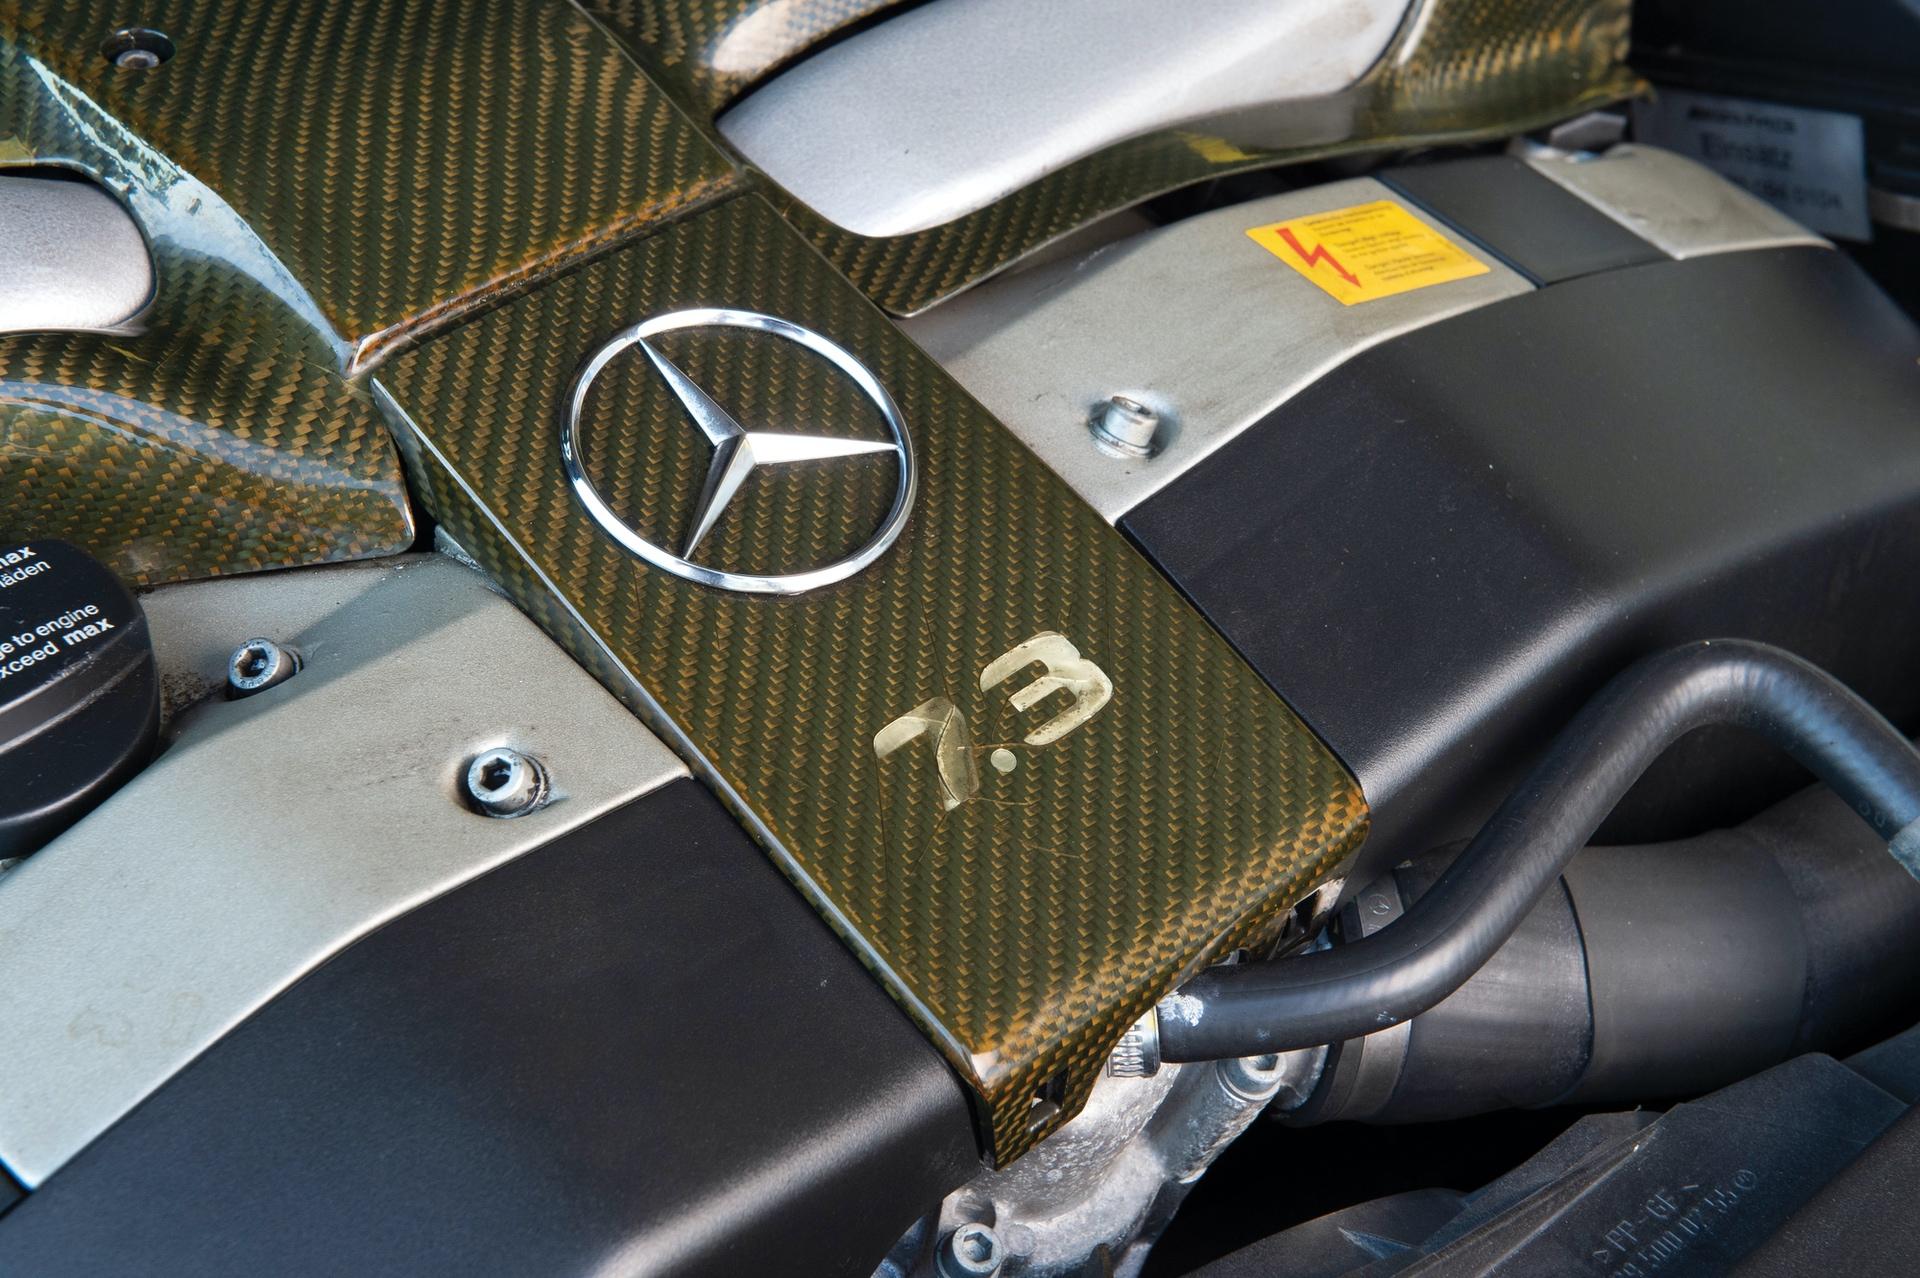 1999-Mercedes-Benz-SL-73-AMG-_18